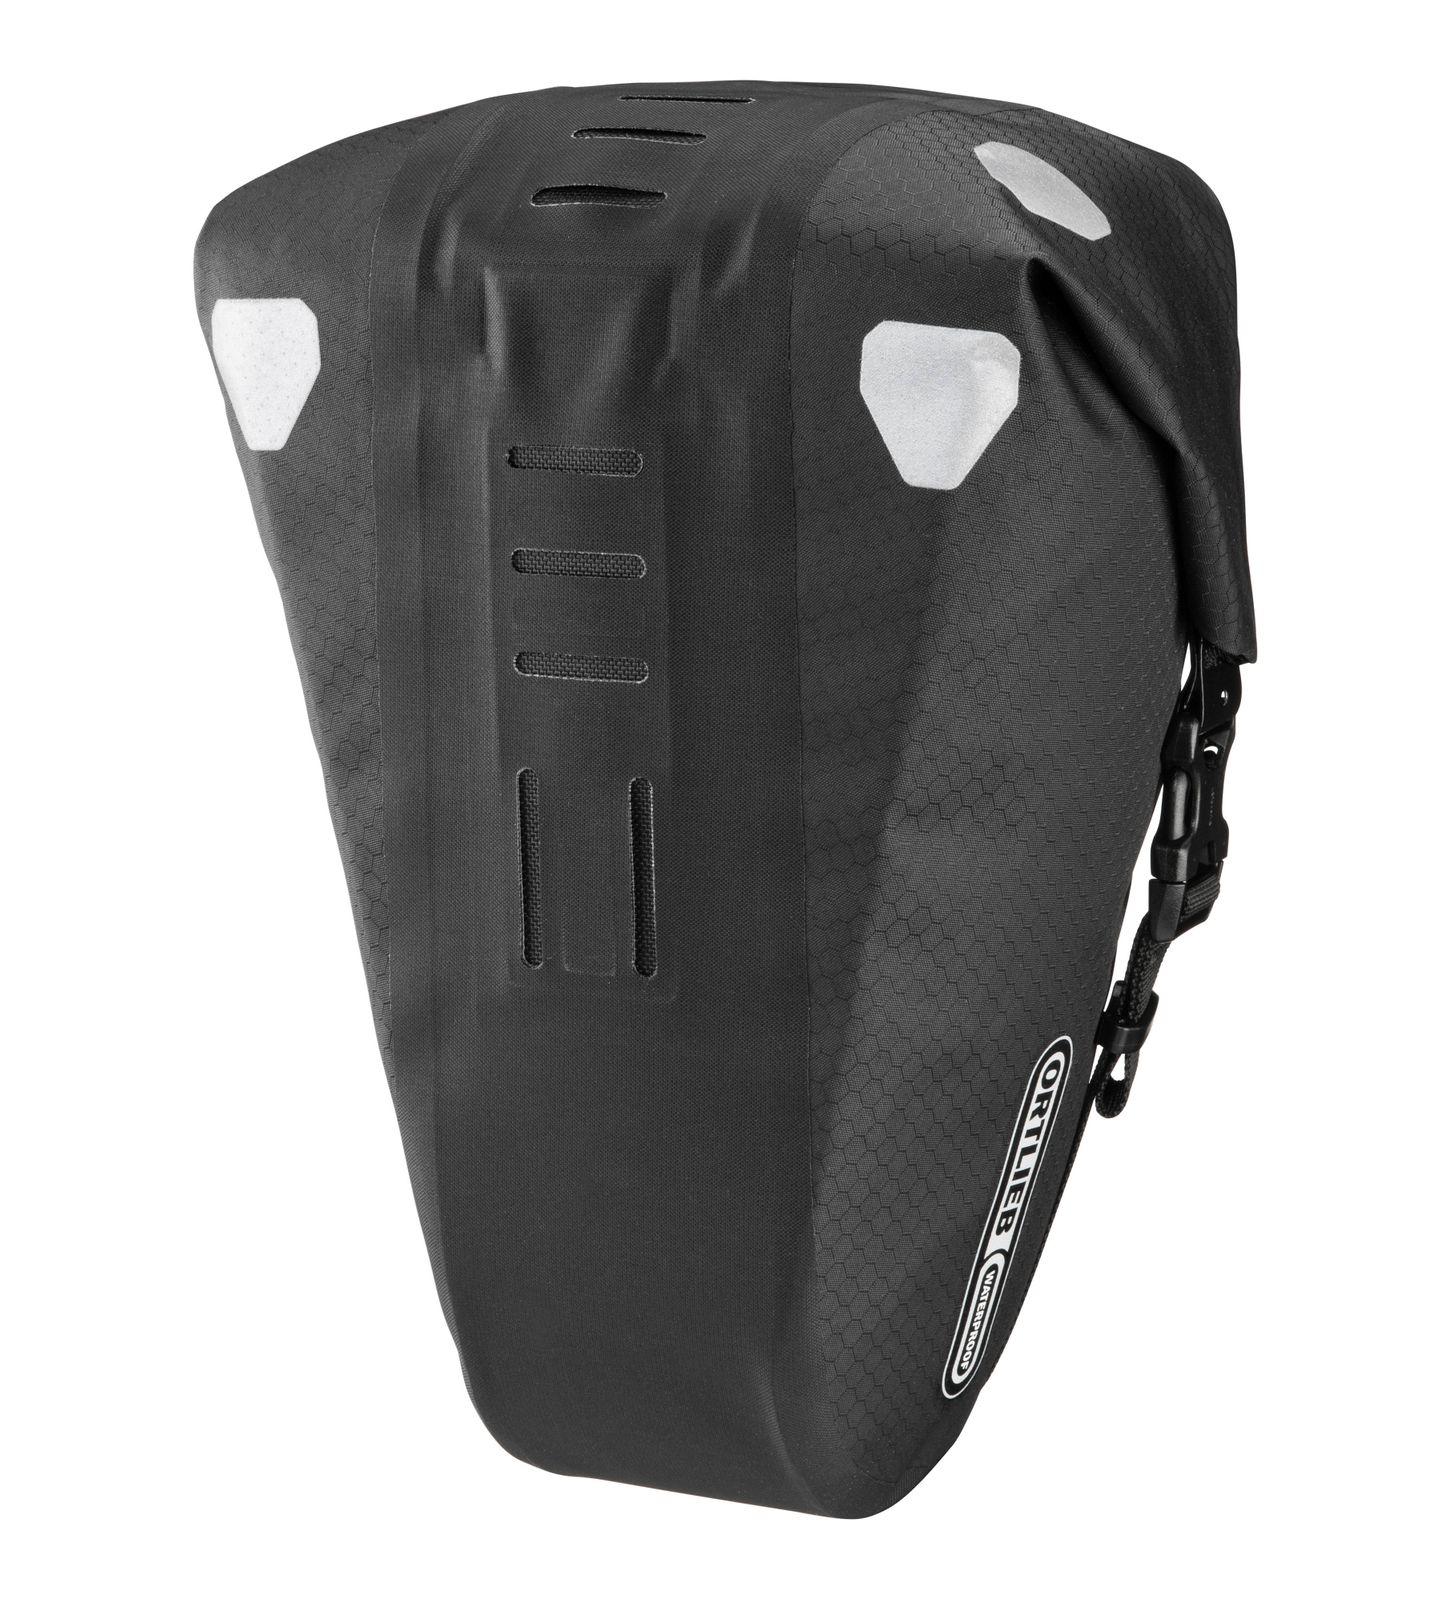 ORTLIEB Sport Cycling Saddle-Bag Two Bike Saddle Bag 4,1L Black Matt